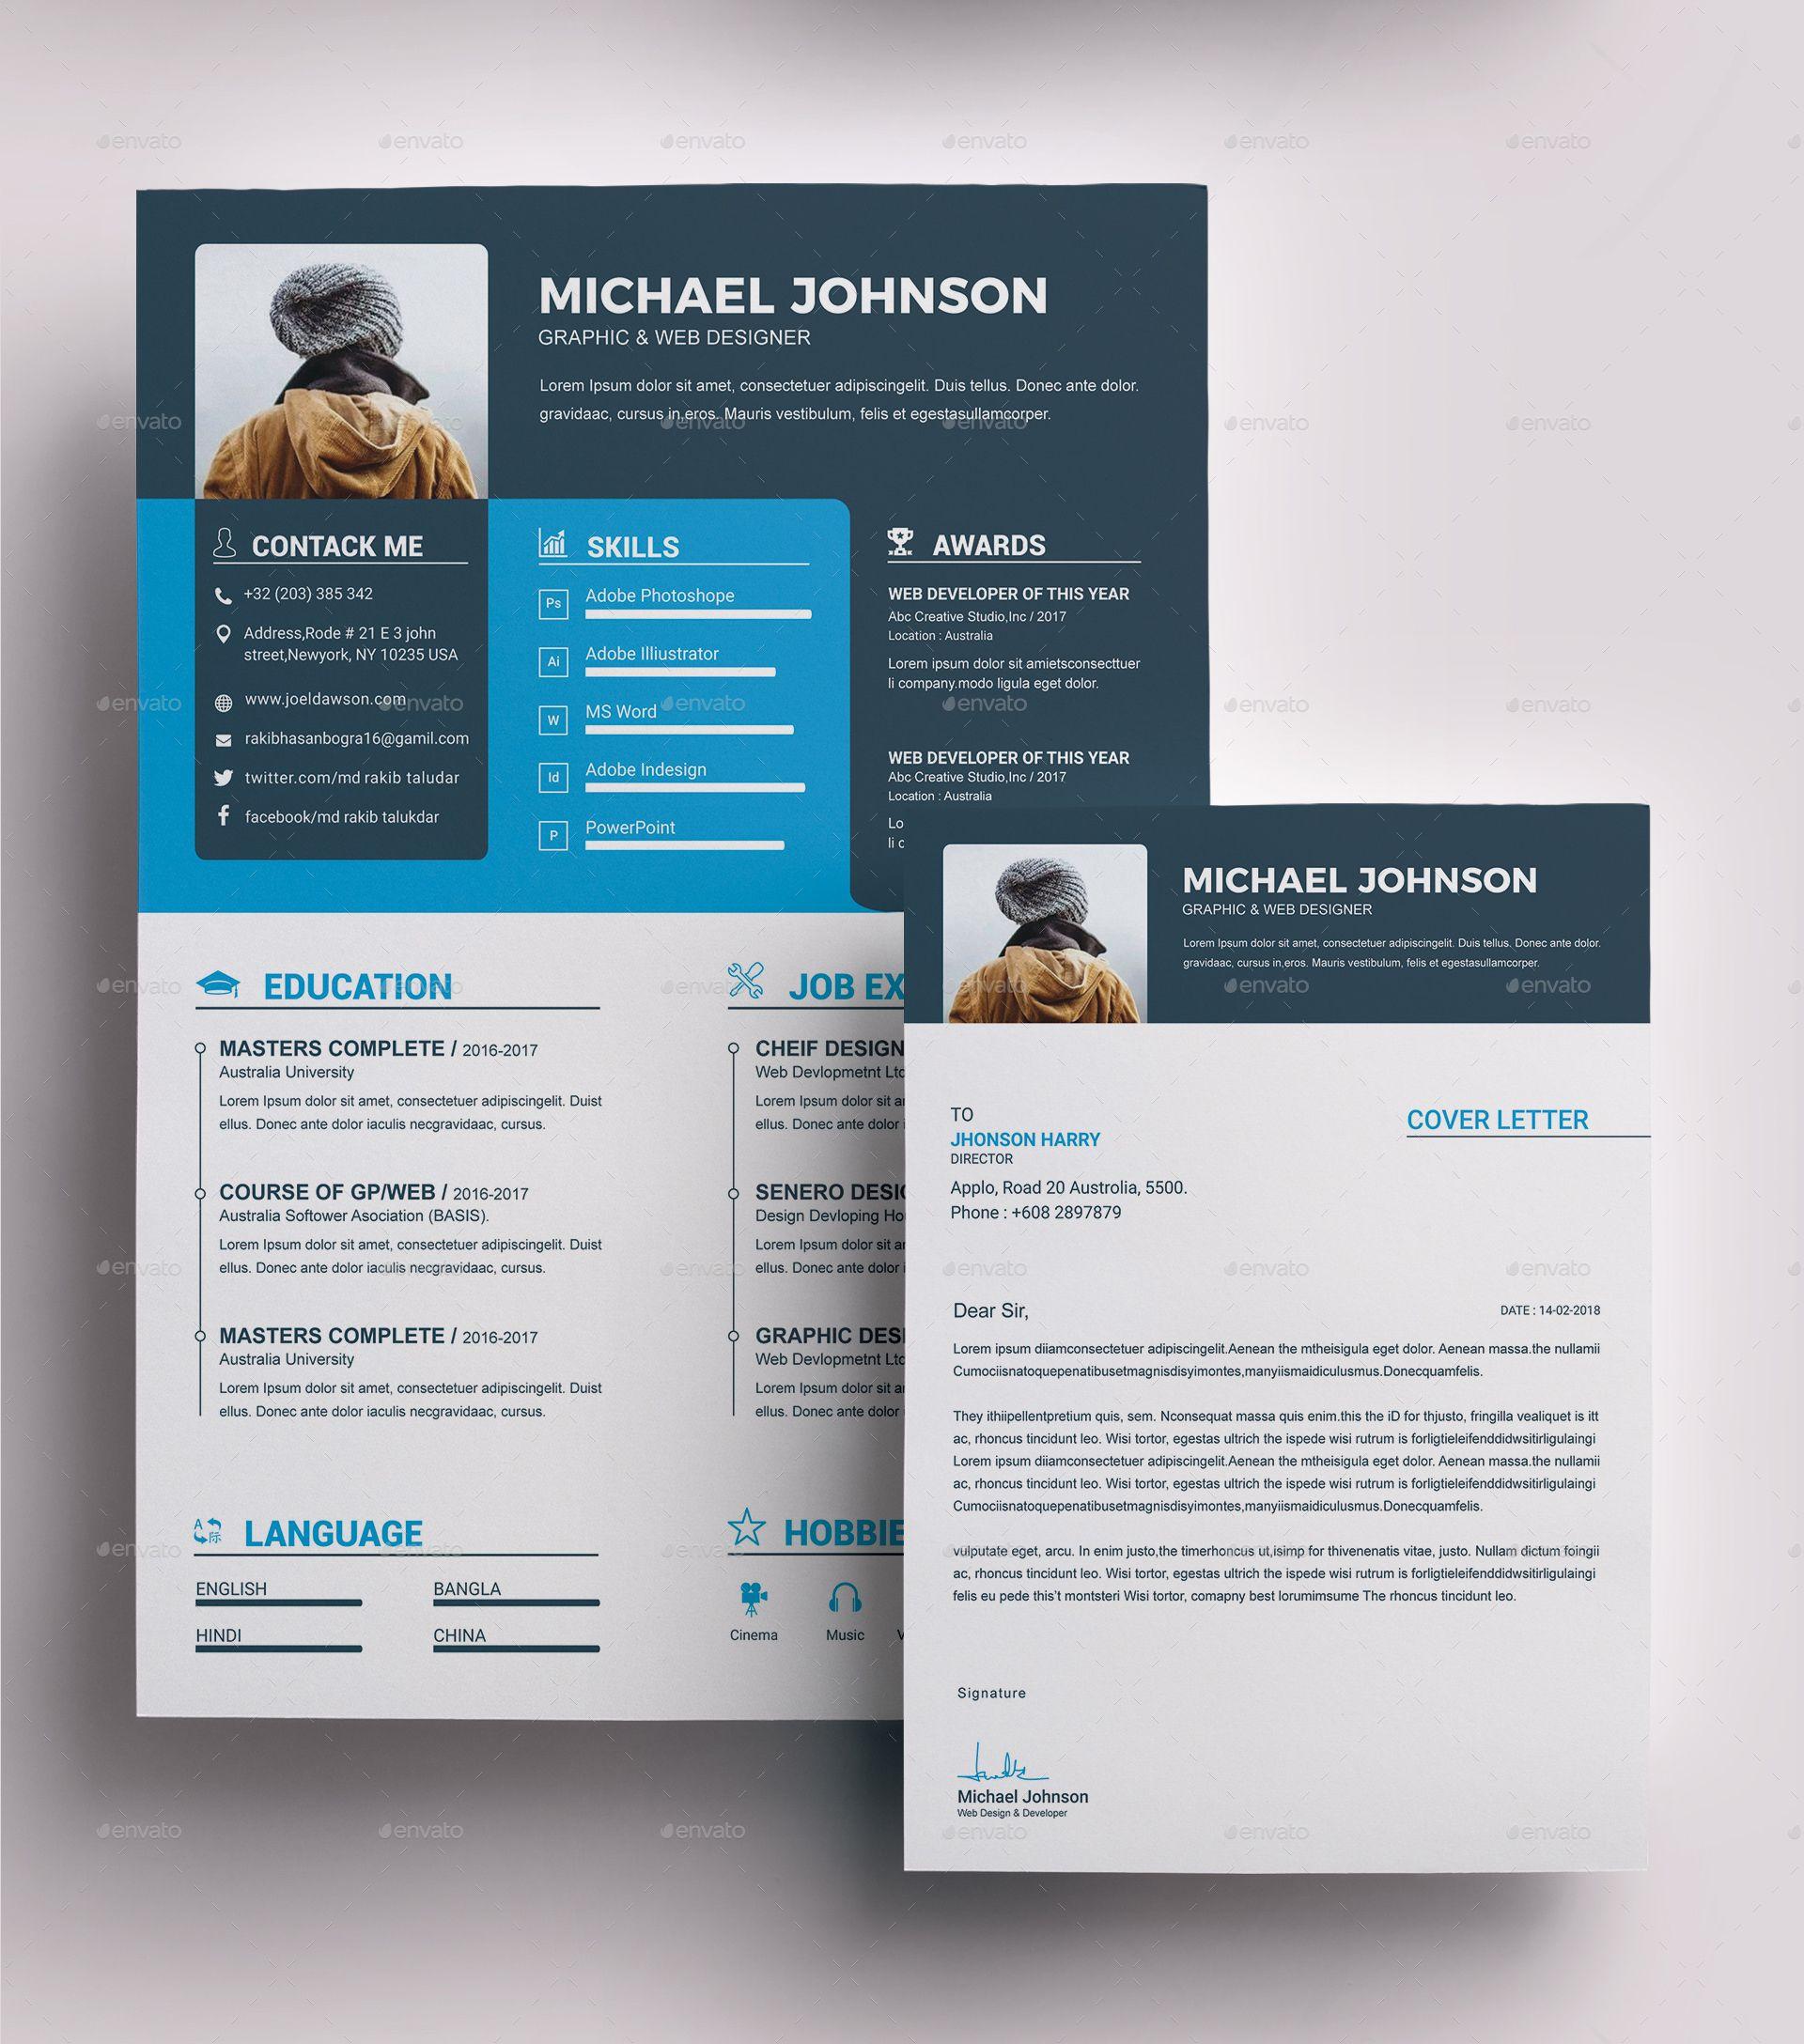 Resume Bundle Resume Writing Services Resume Design Education Jobs